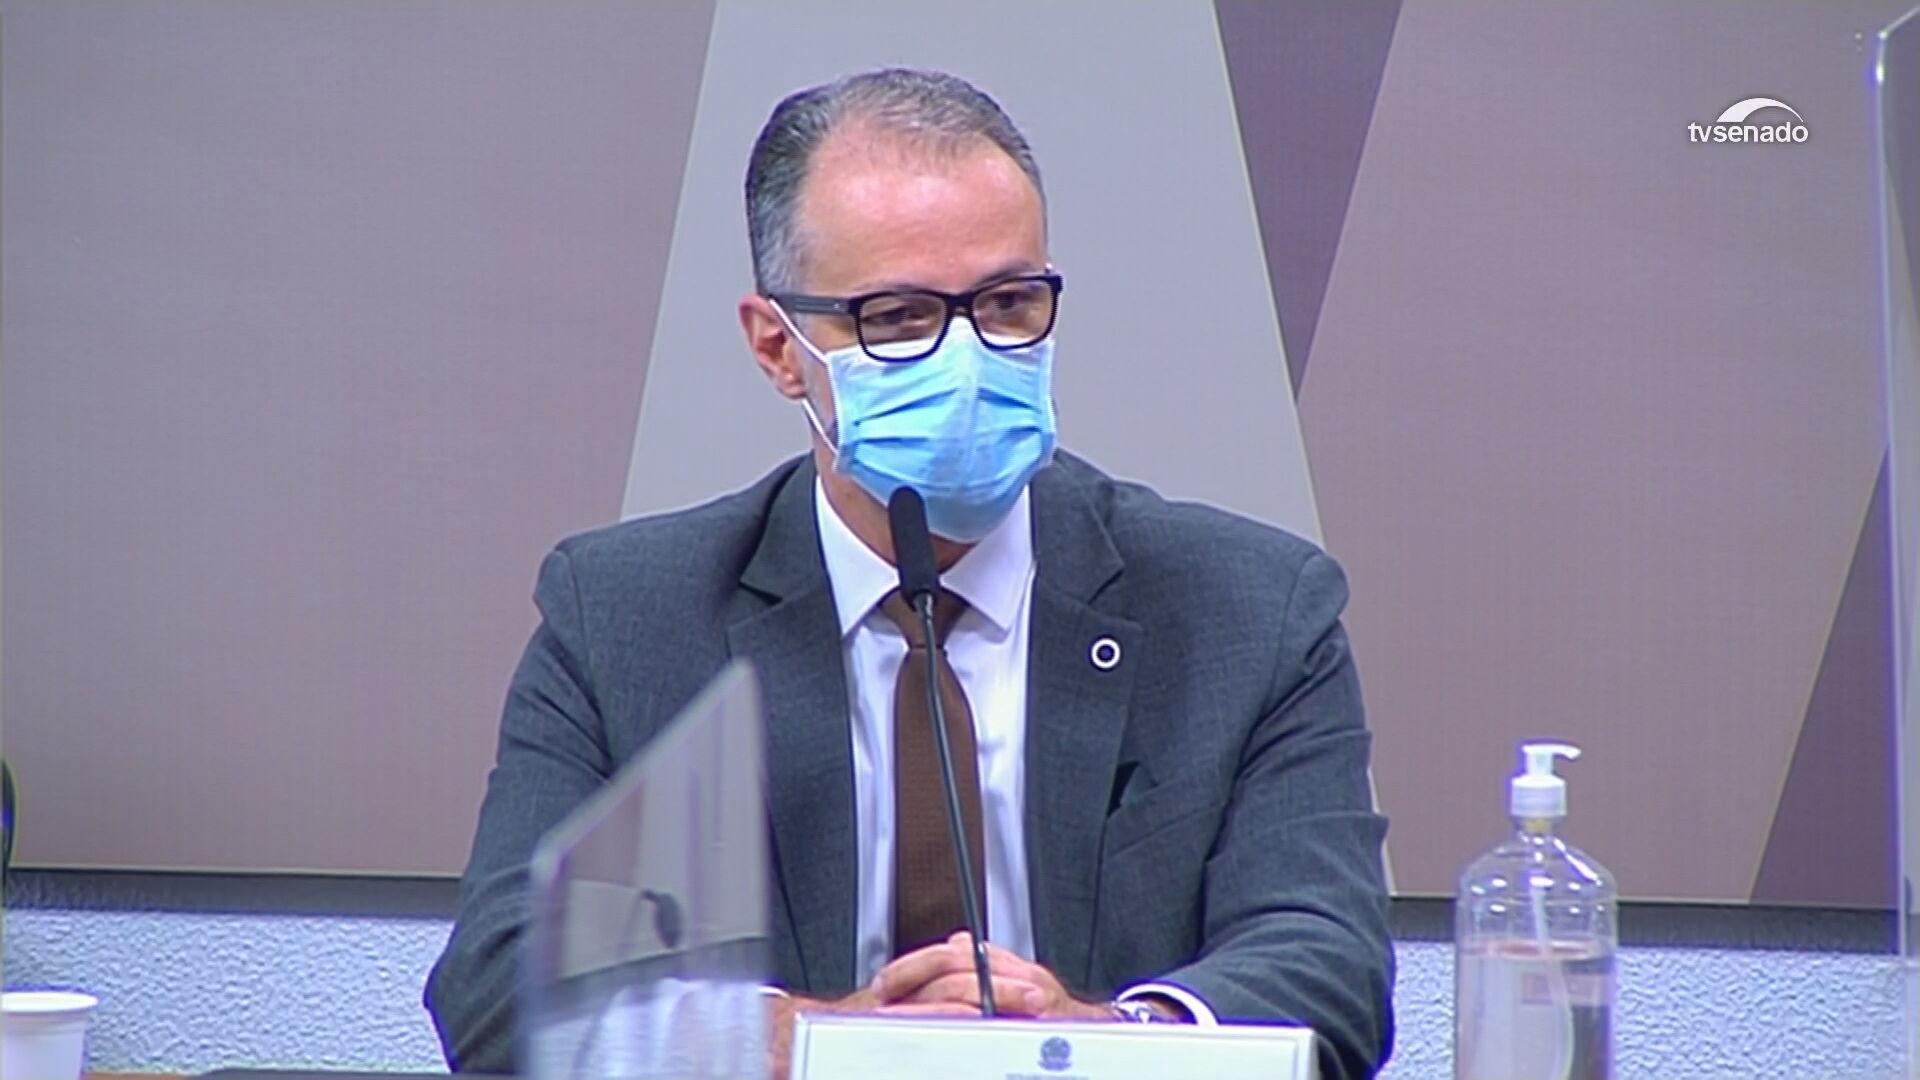 Diretor-presidente da Anvisa, Antonio Barra Torres presta depoimento a senadores